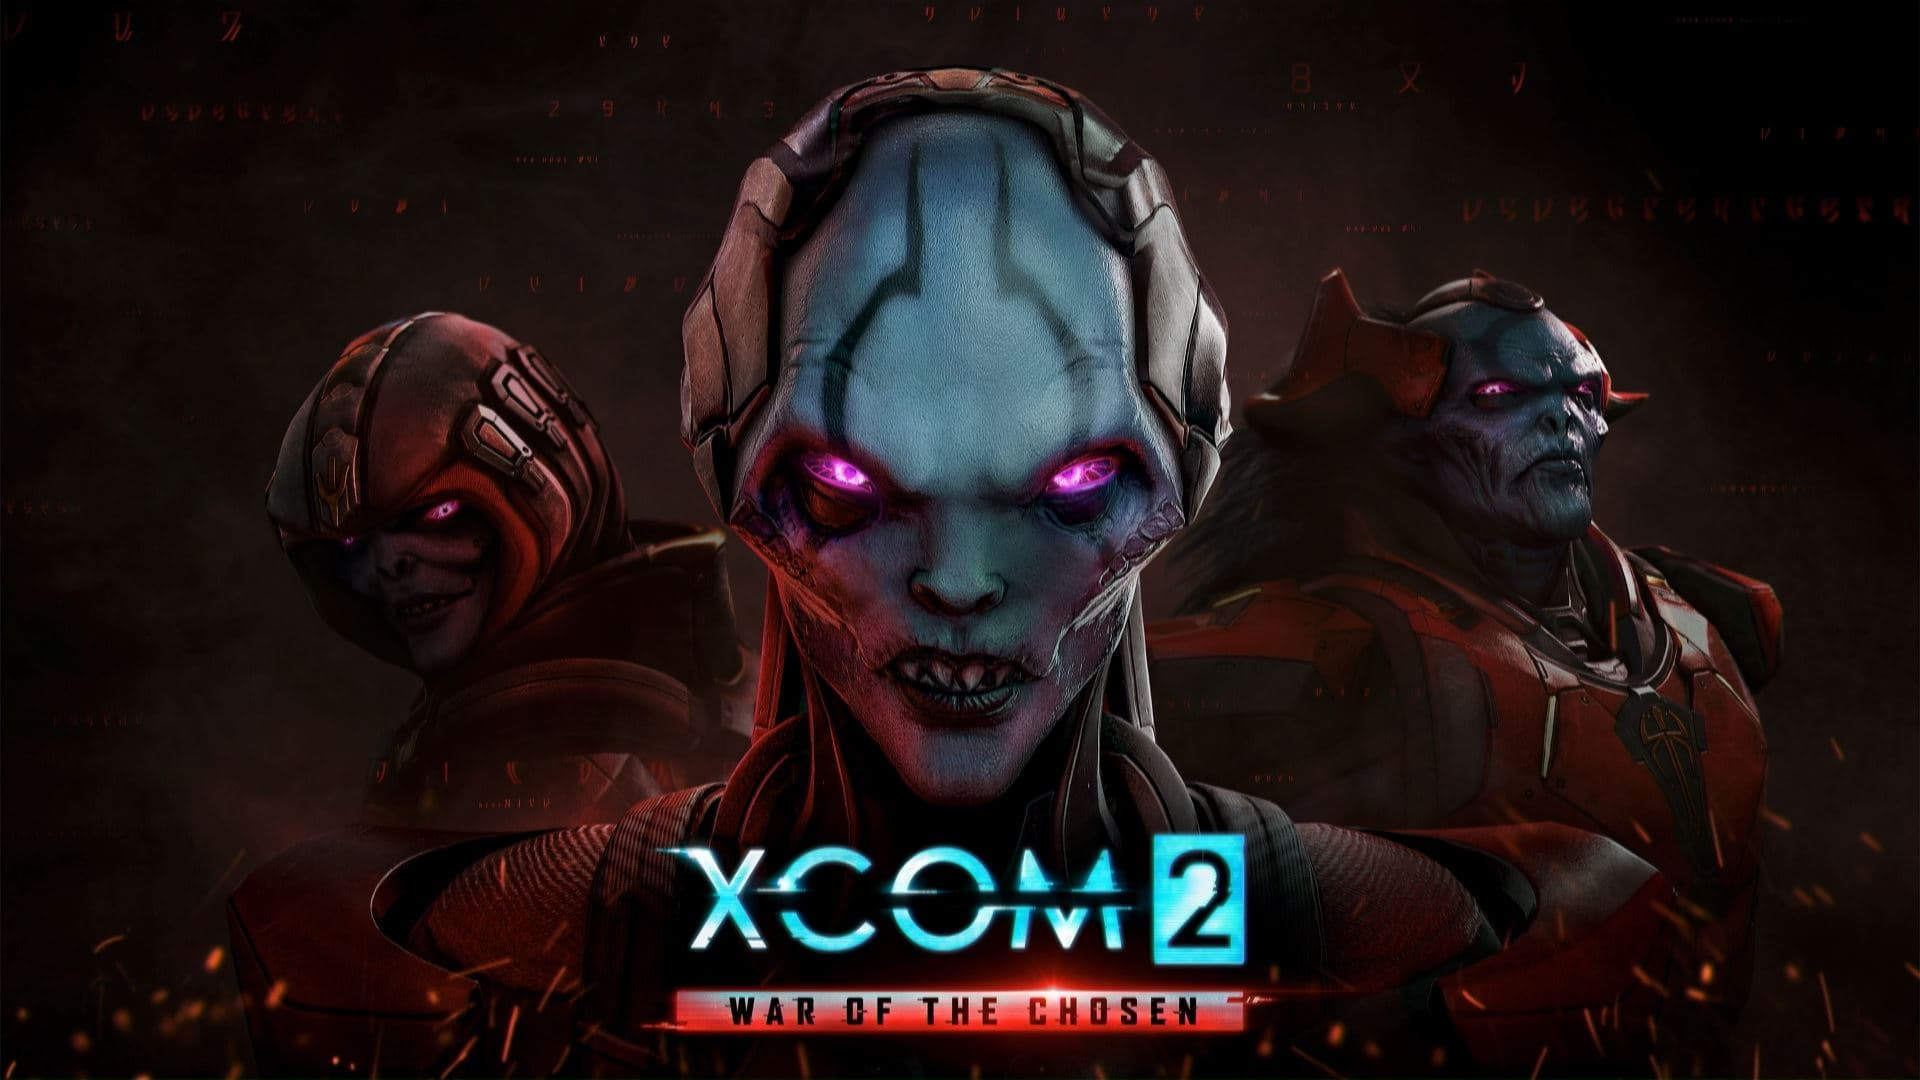 XCOM 2 - War of the Chosen Xbox